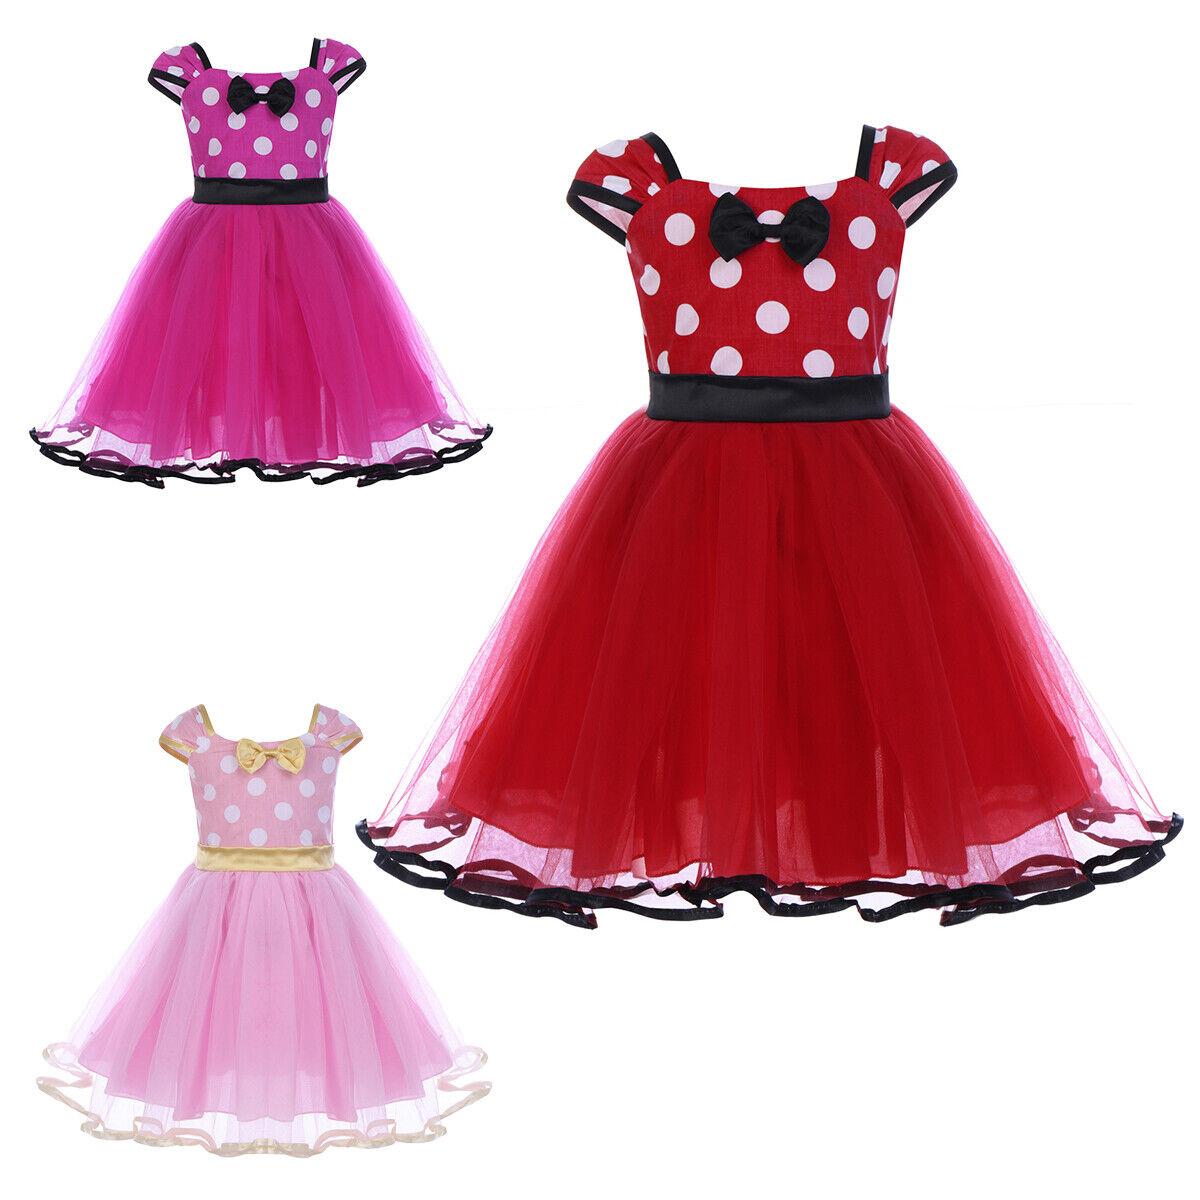 Kids Baby Girls Fairy Bow Paillett Tutu Princess Party Princess Dress 3-24M